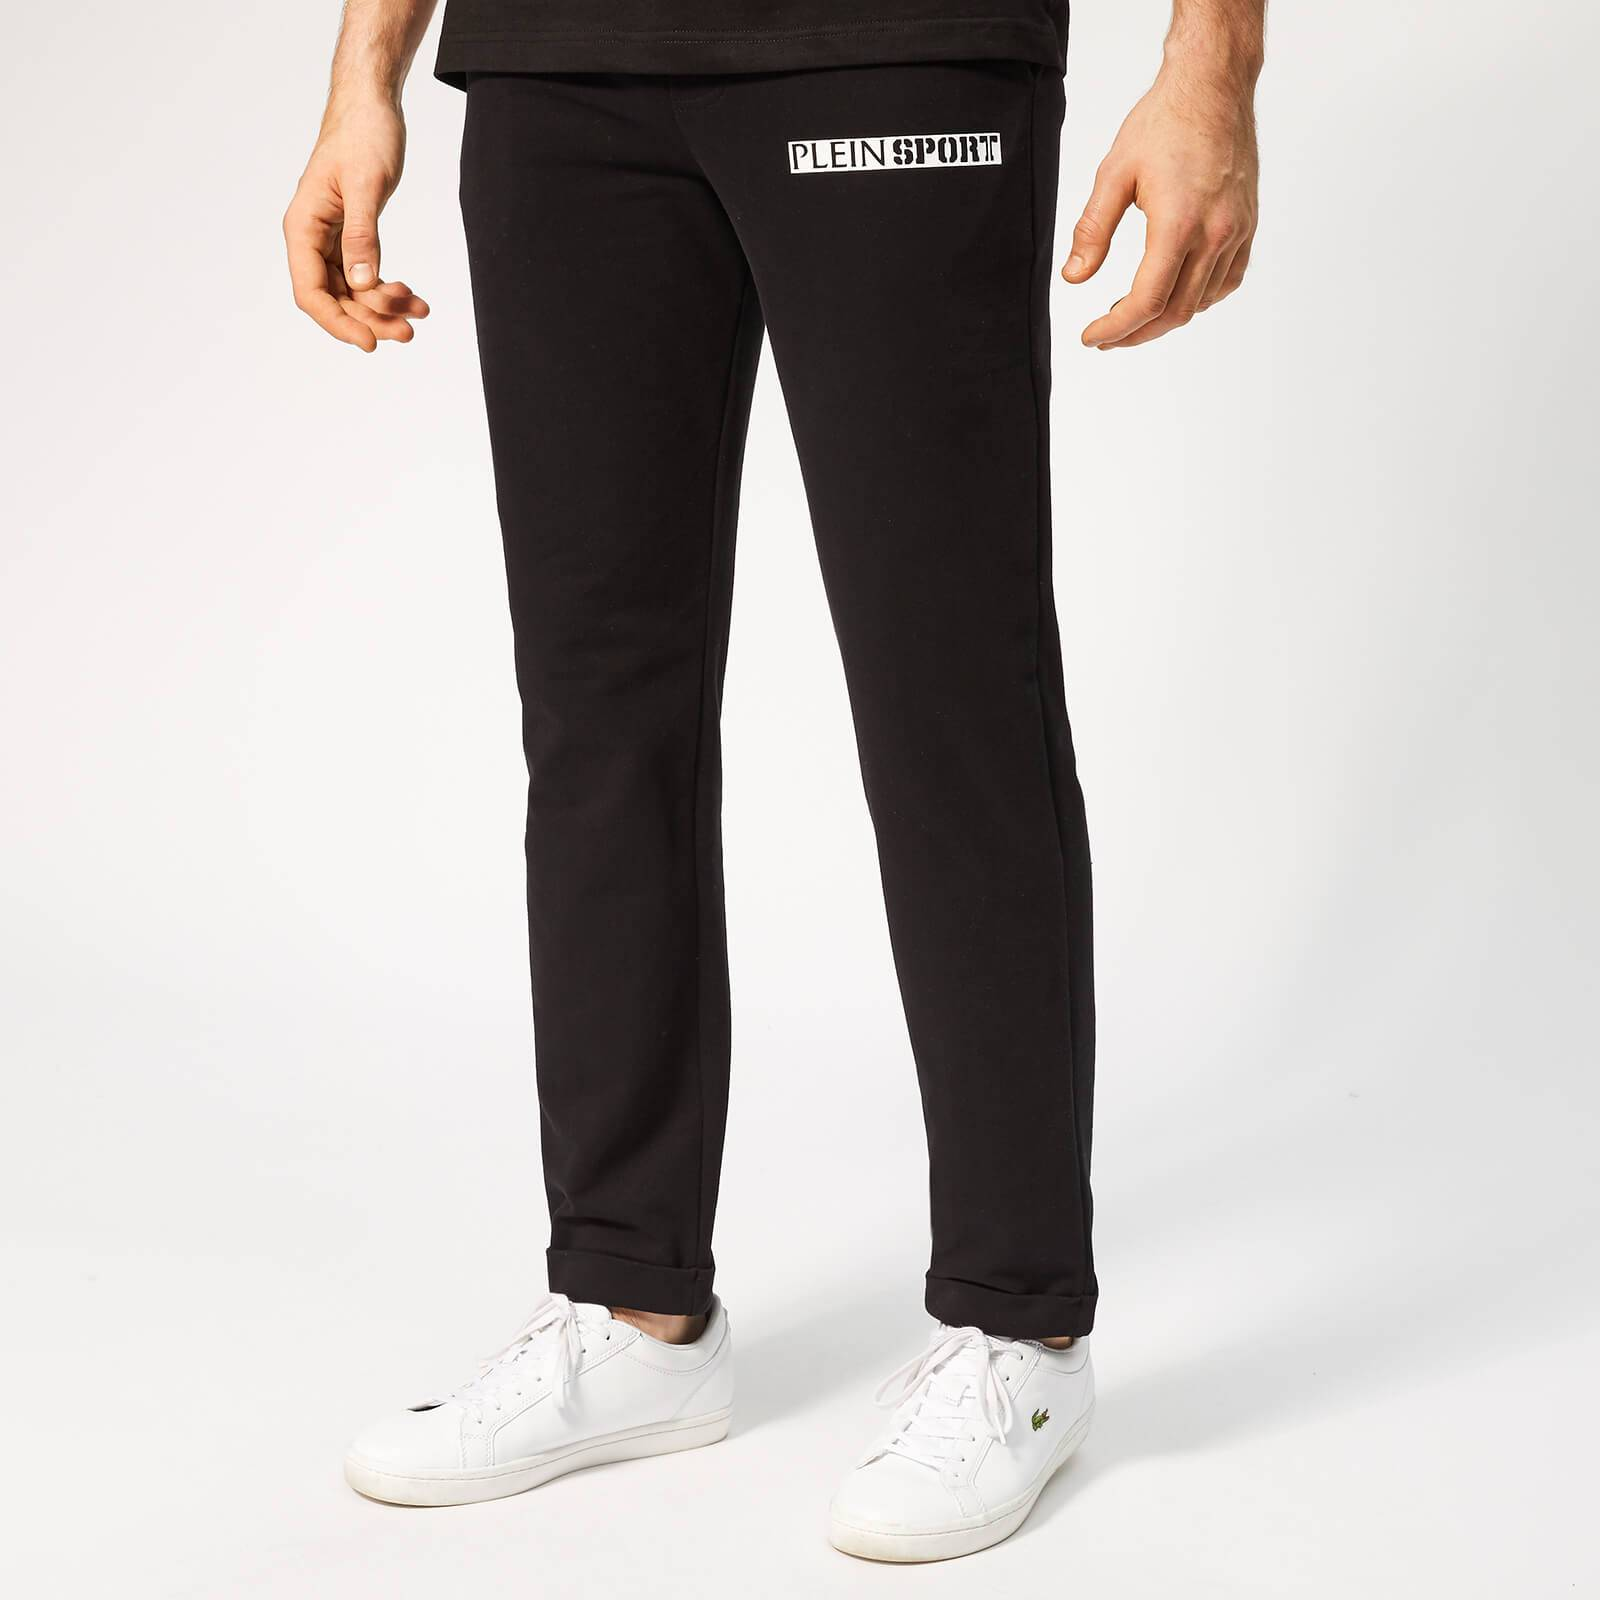 Plein Sport Men's Statement Jogging Trousers - Black - XXL - Black